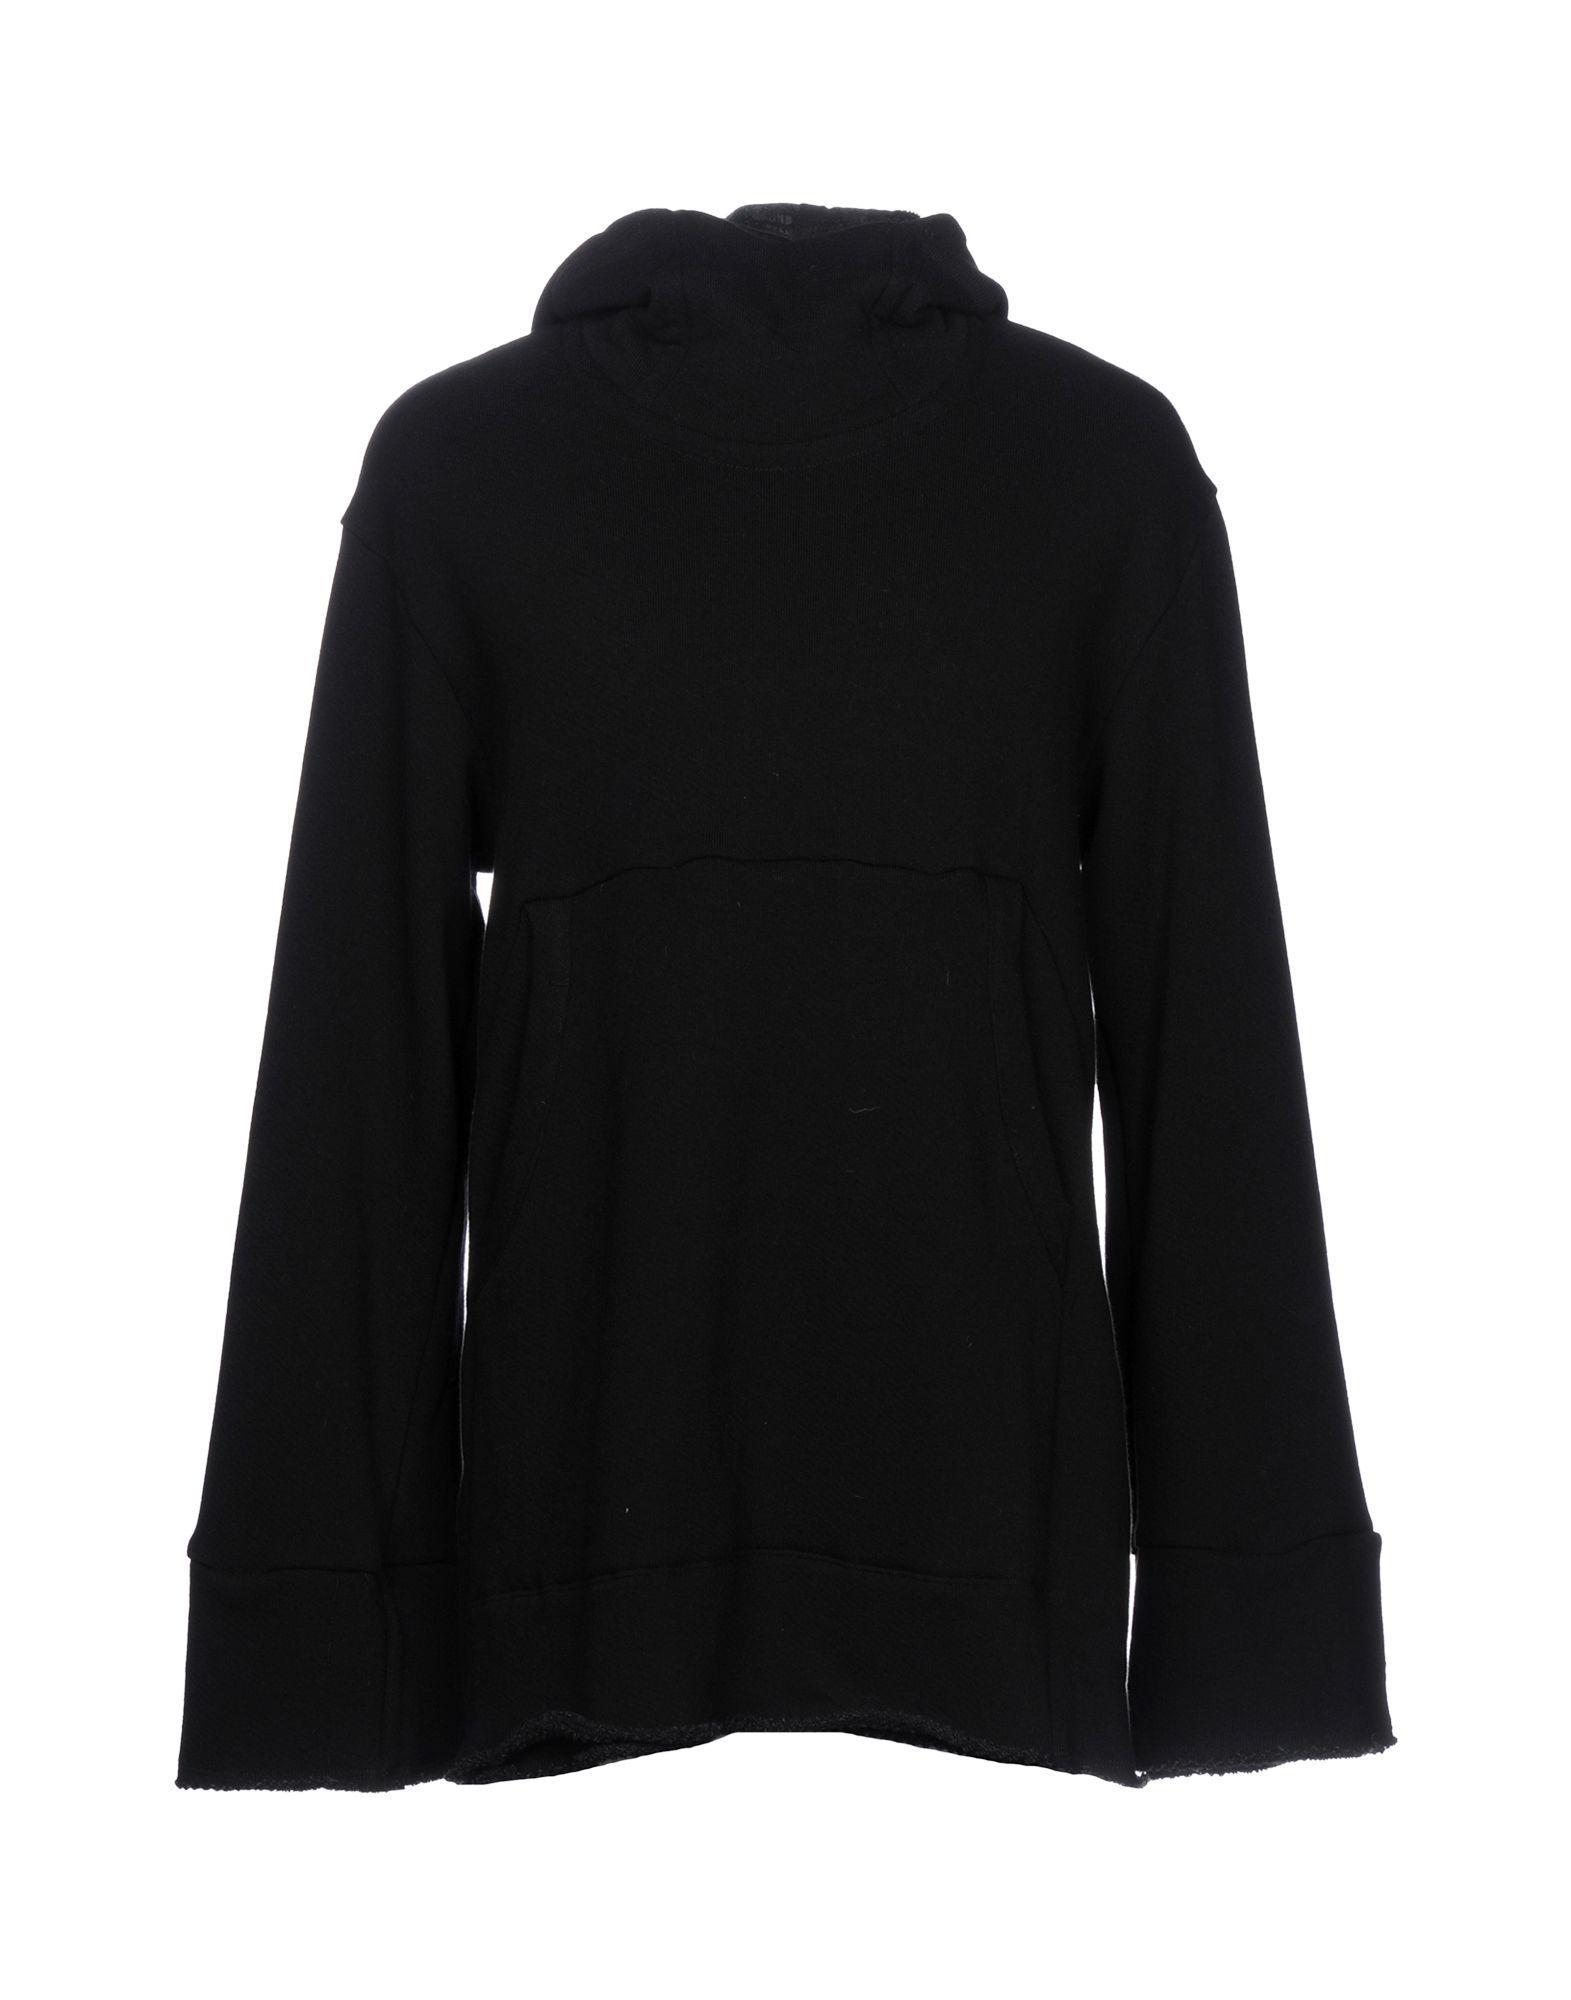 Lost & Found Hooded Sweatshirt In Black